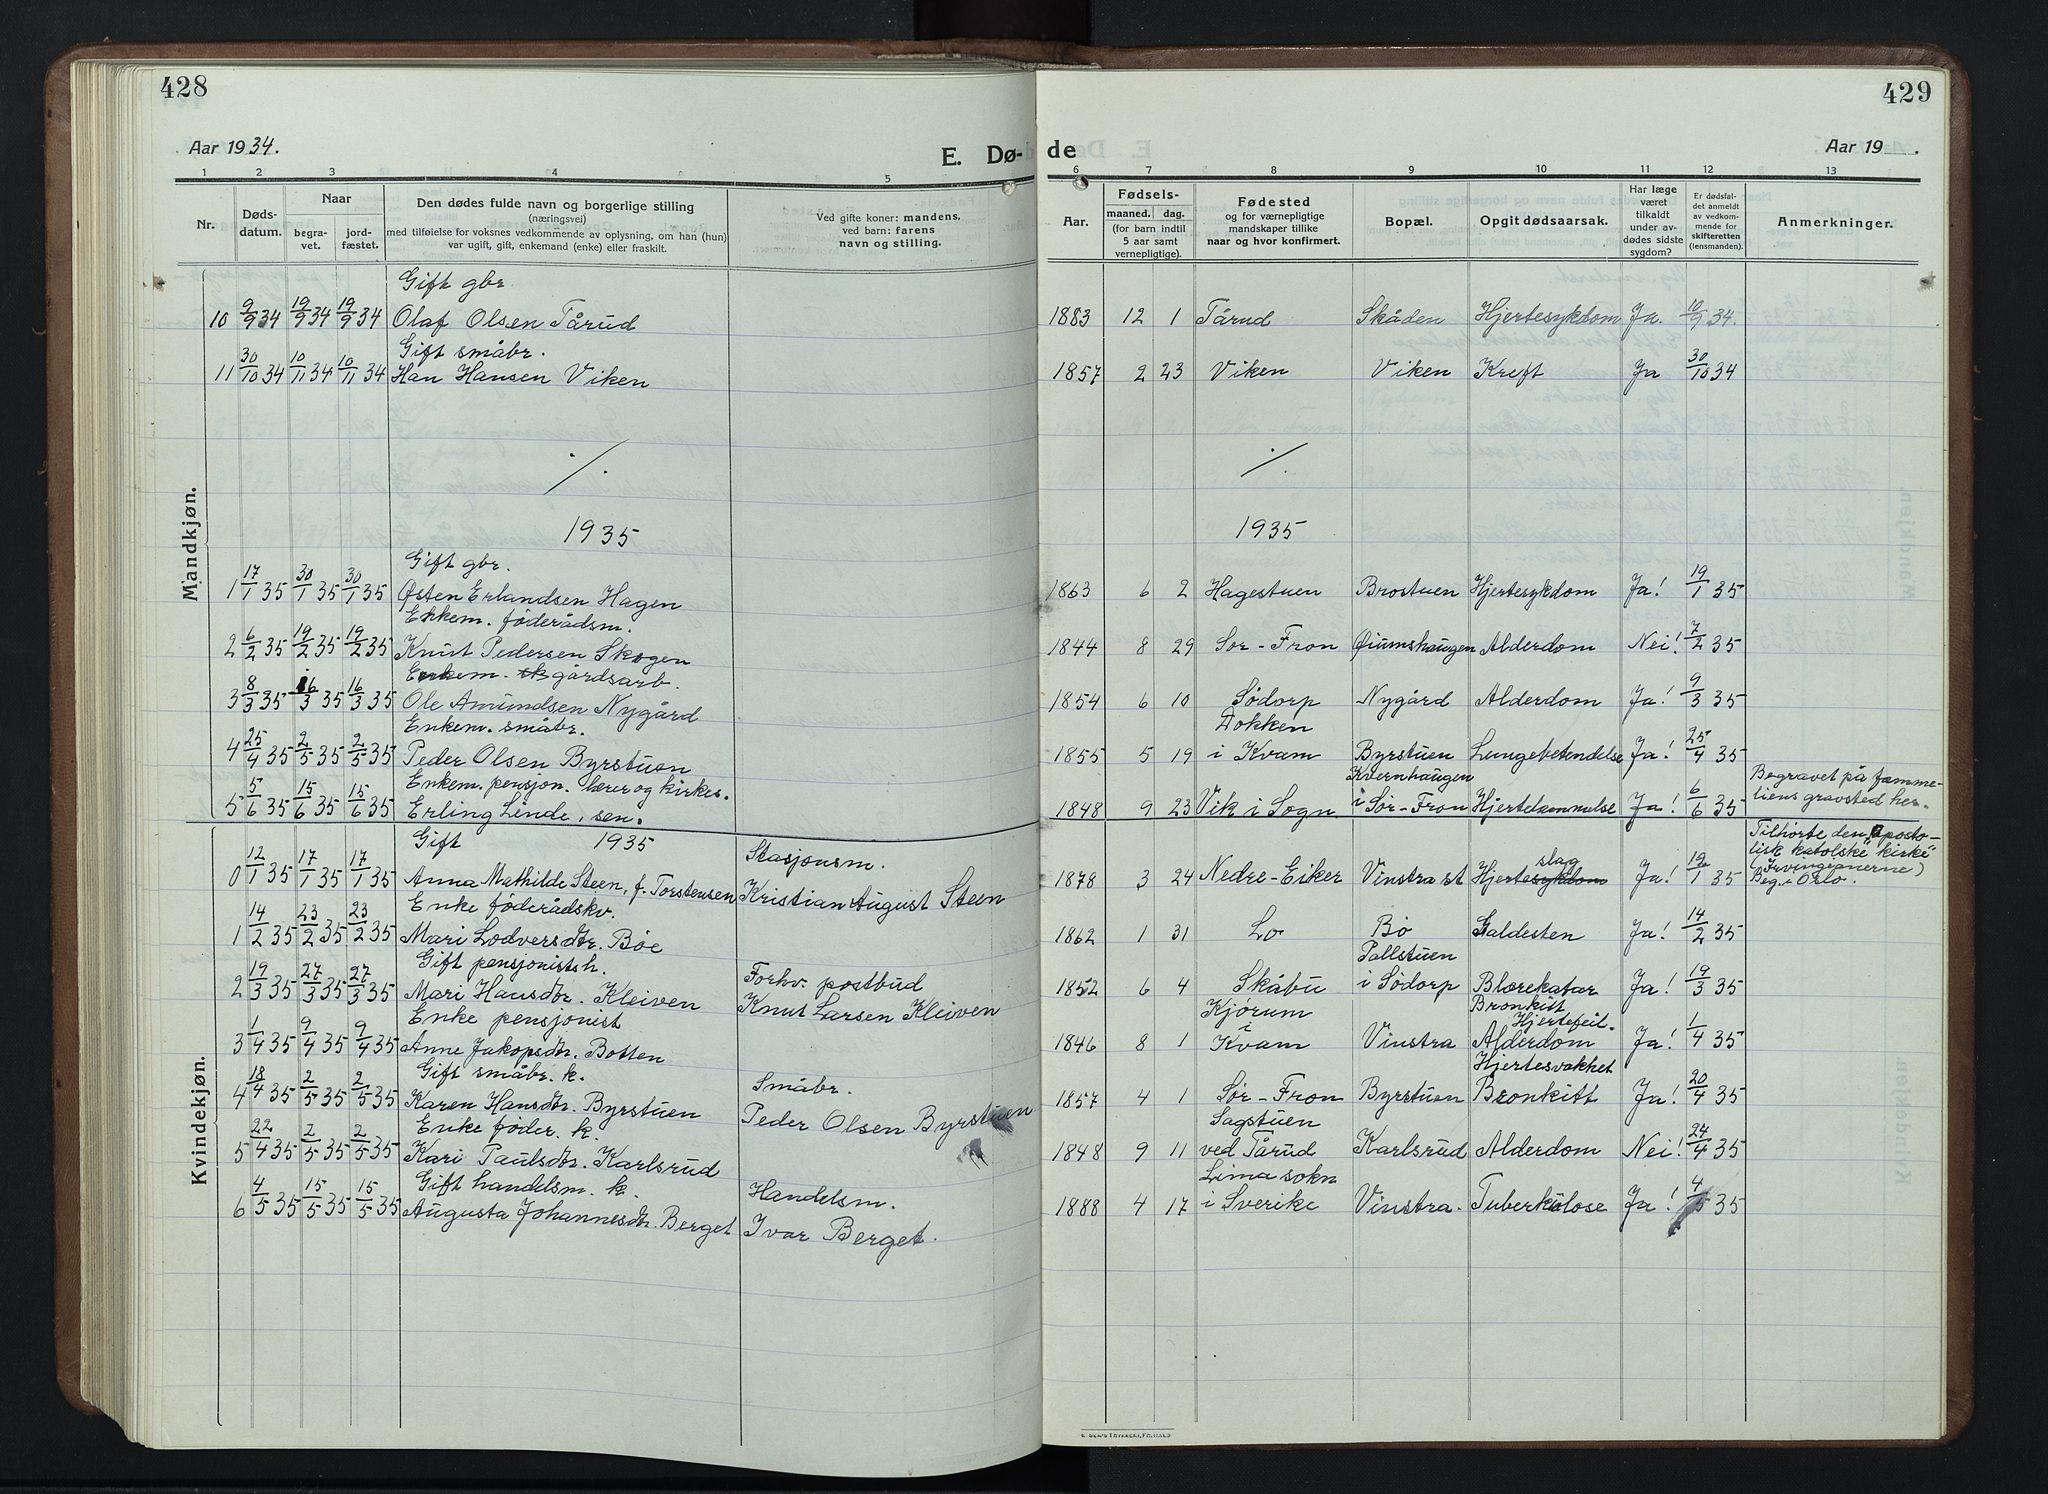 SAH, Nord-Fron prestekontor, Klokkerbok nr. 7, 1915-1946, s. 428-429